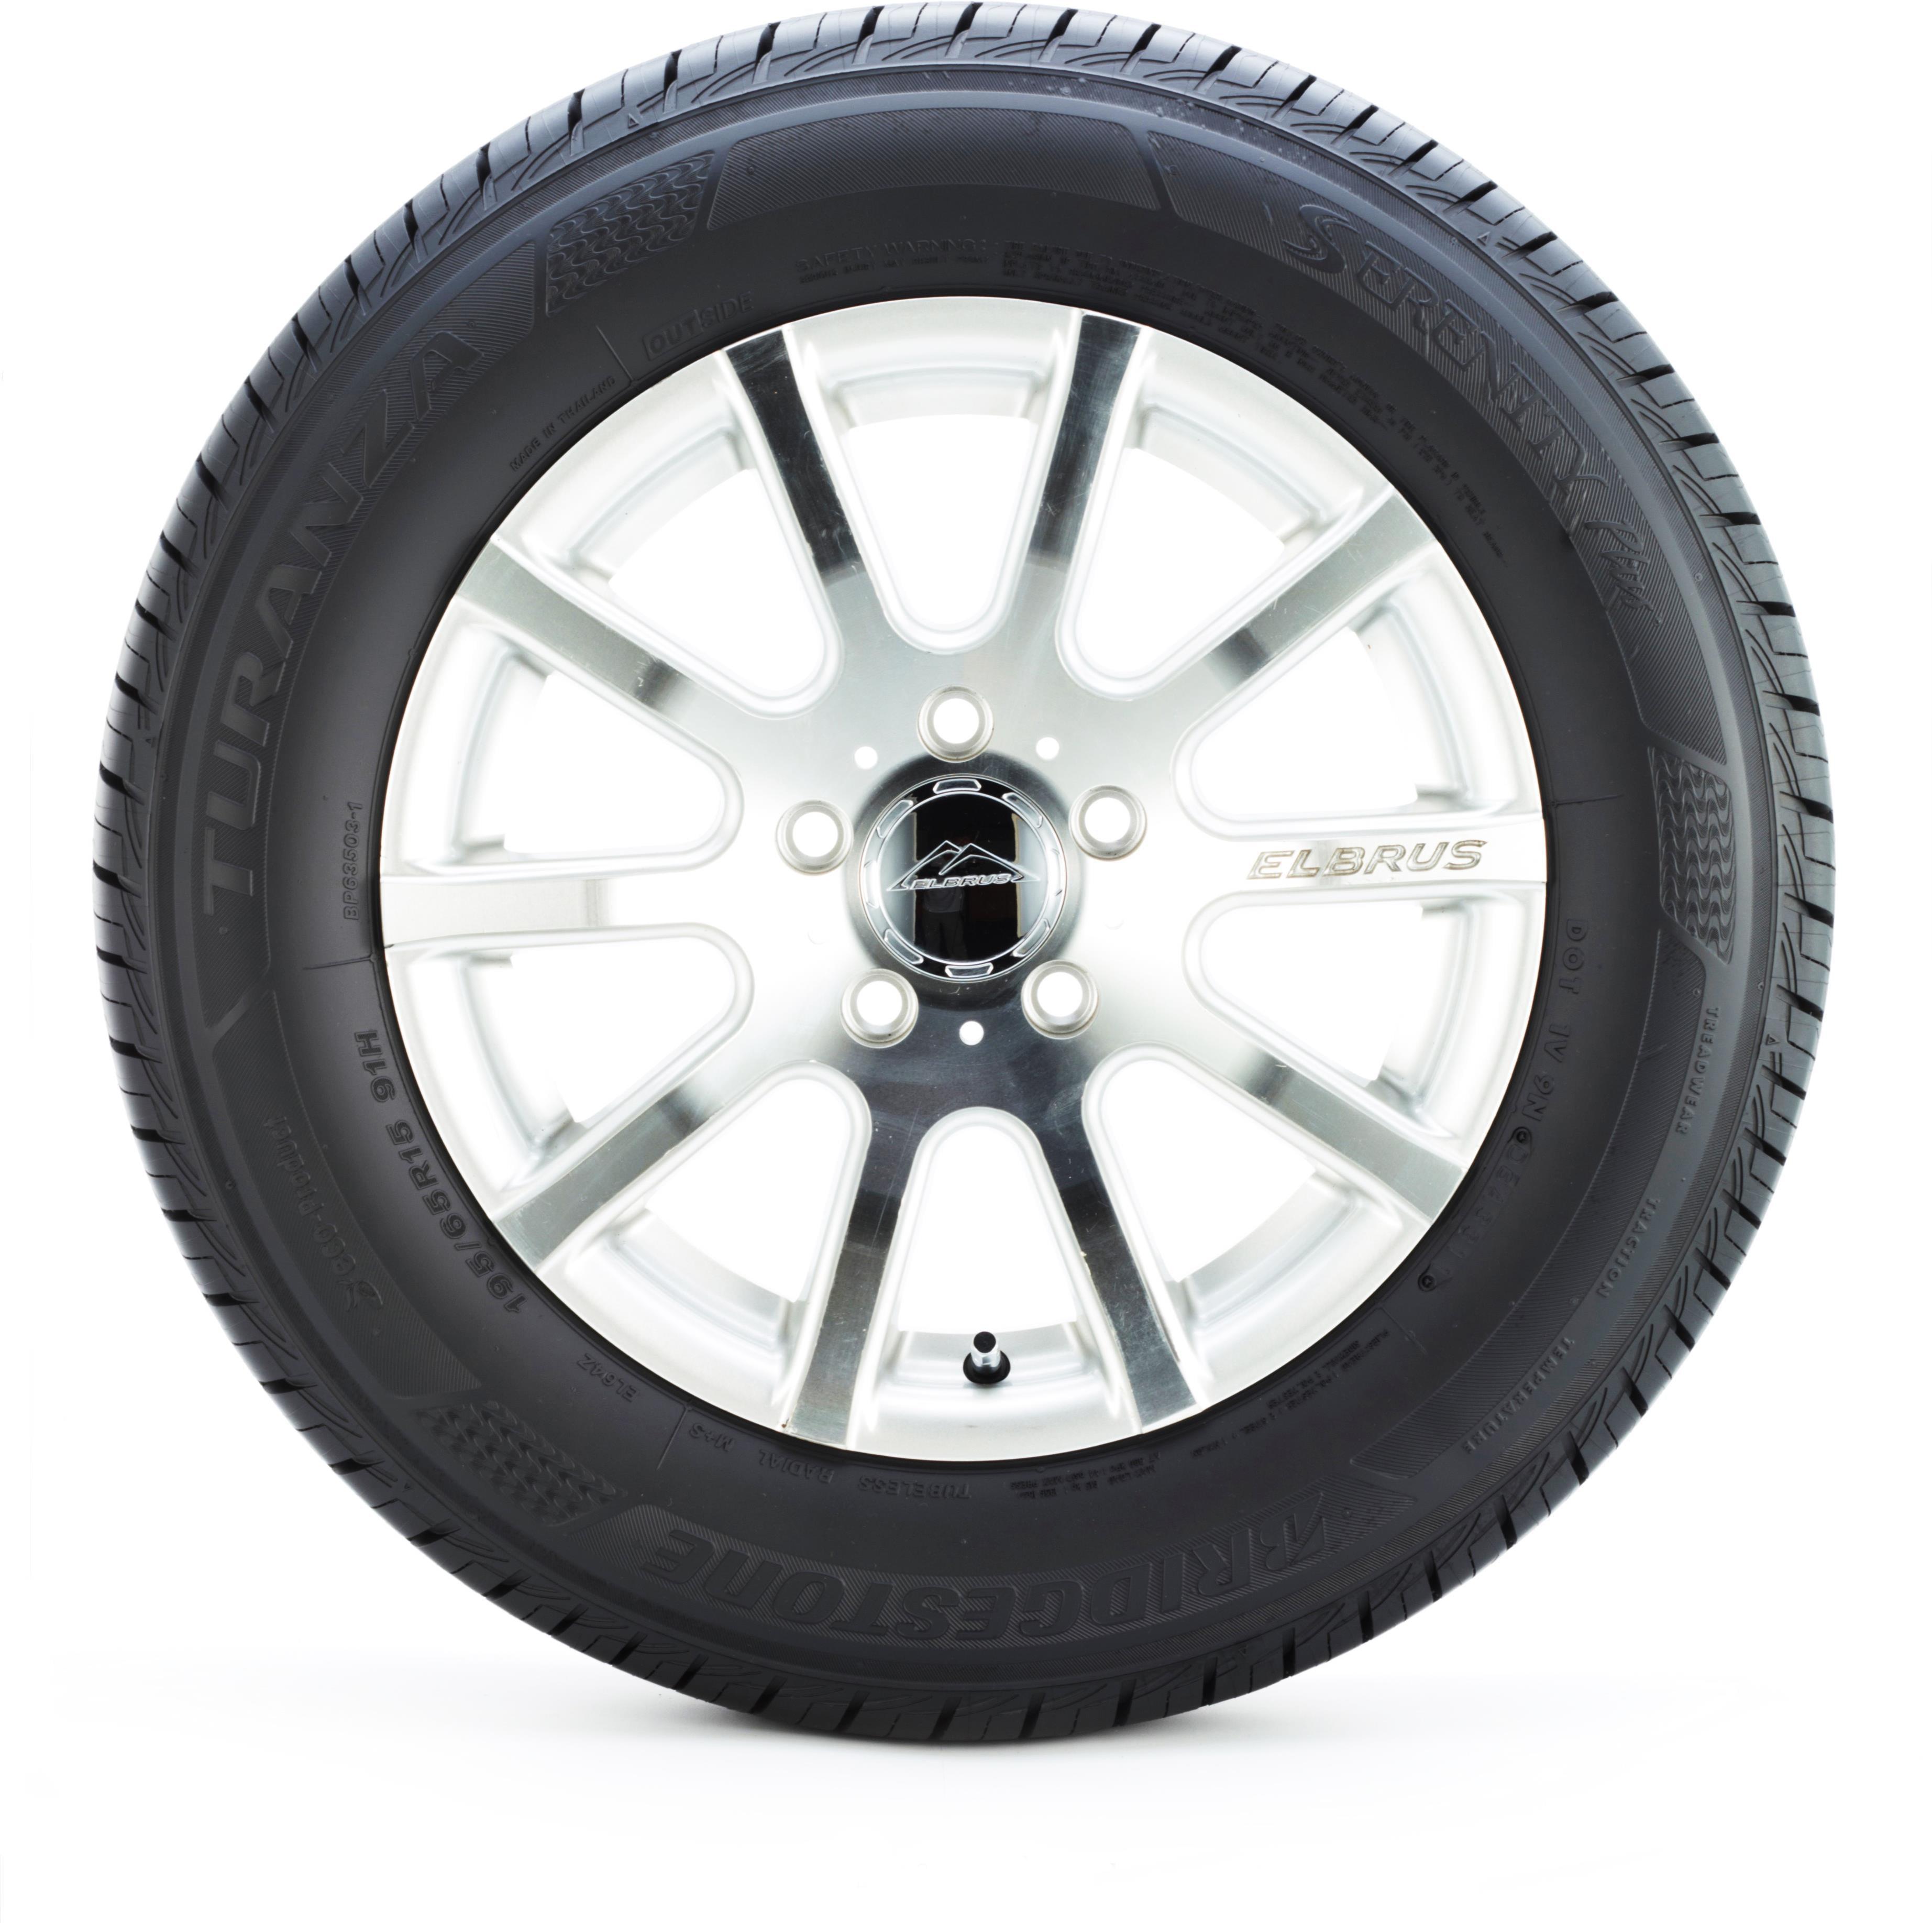 Bridgestone Turanza Serenity Plus >> Auto Parts Accessories Bridgestone Turanza Serenity Plus